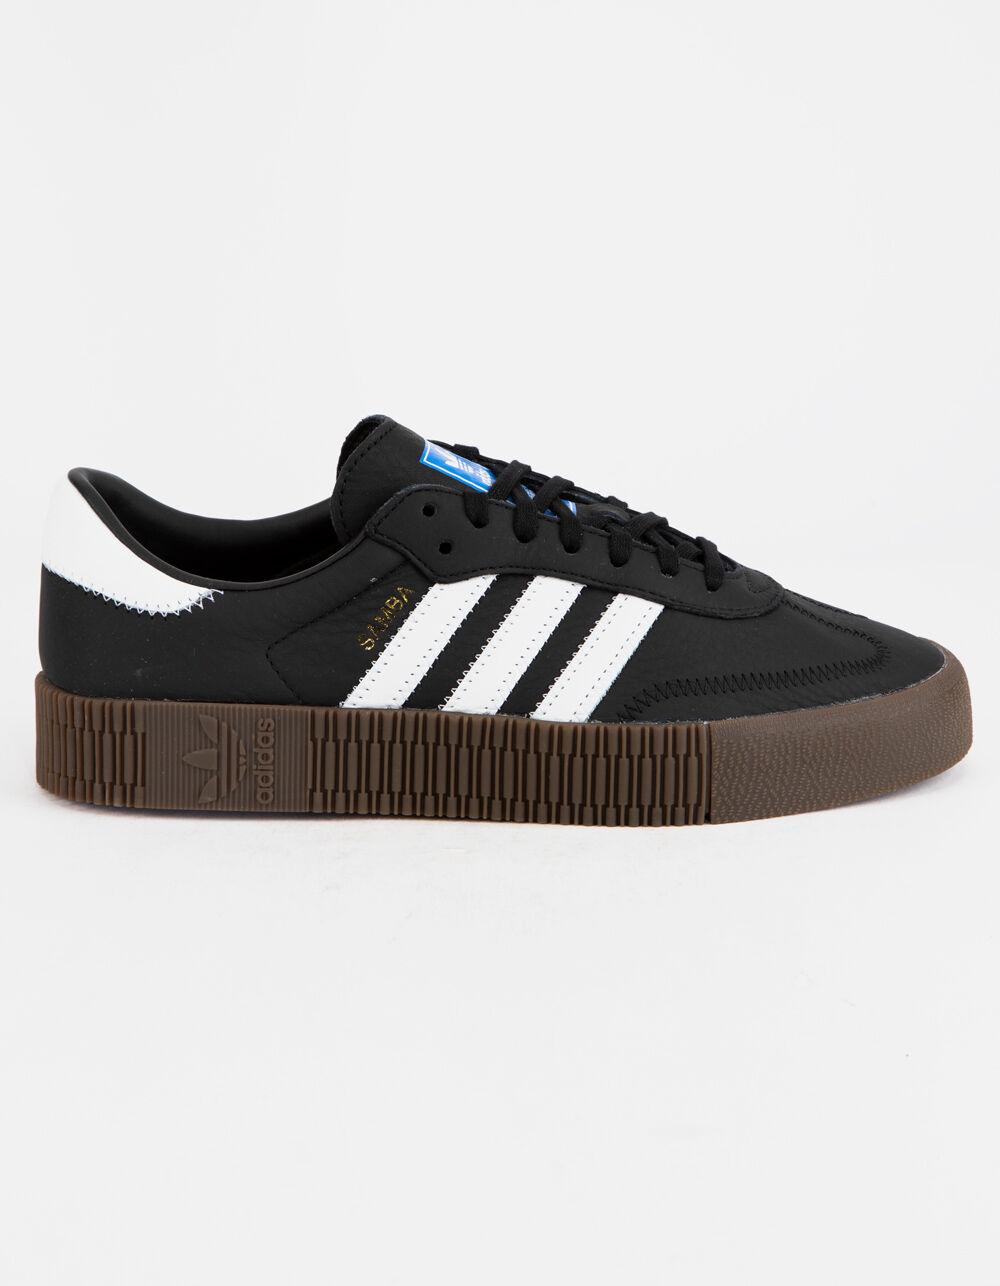 ADIDAS Sambarose Core Black & Gum Shoes